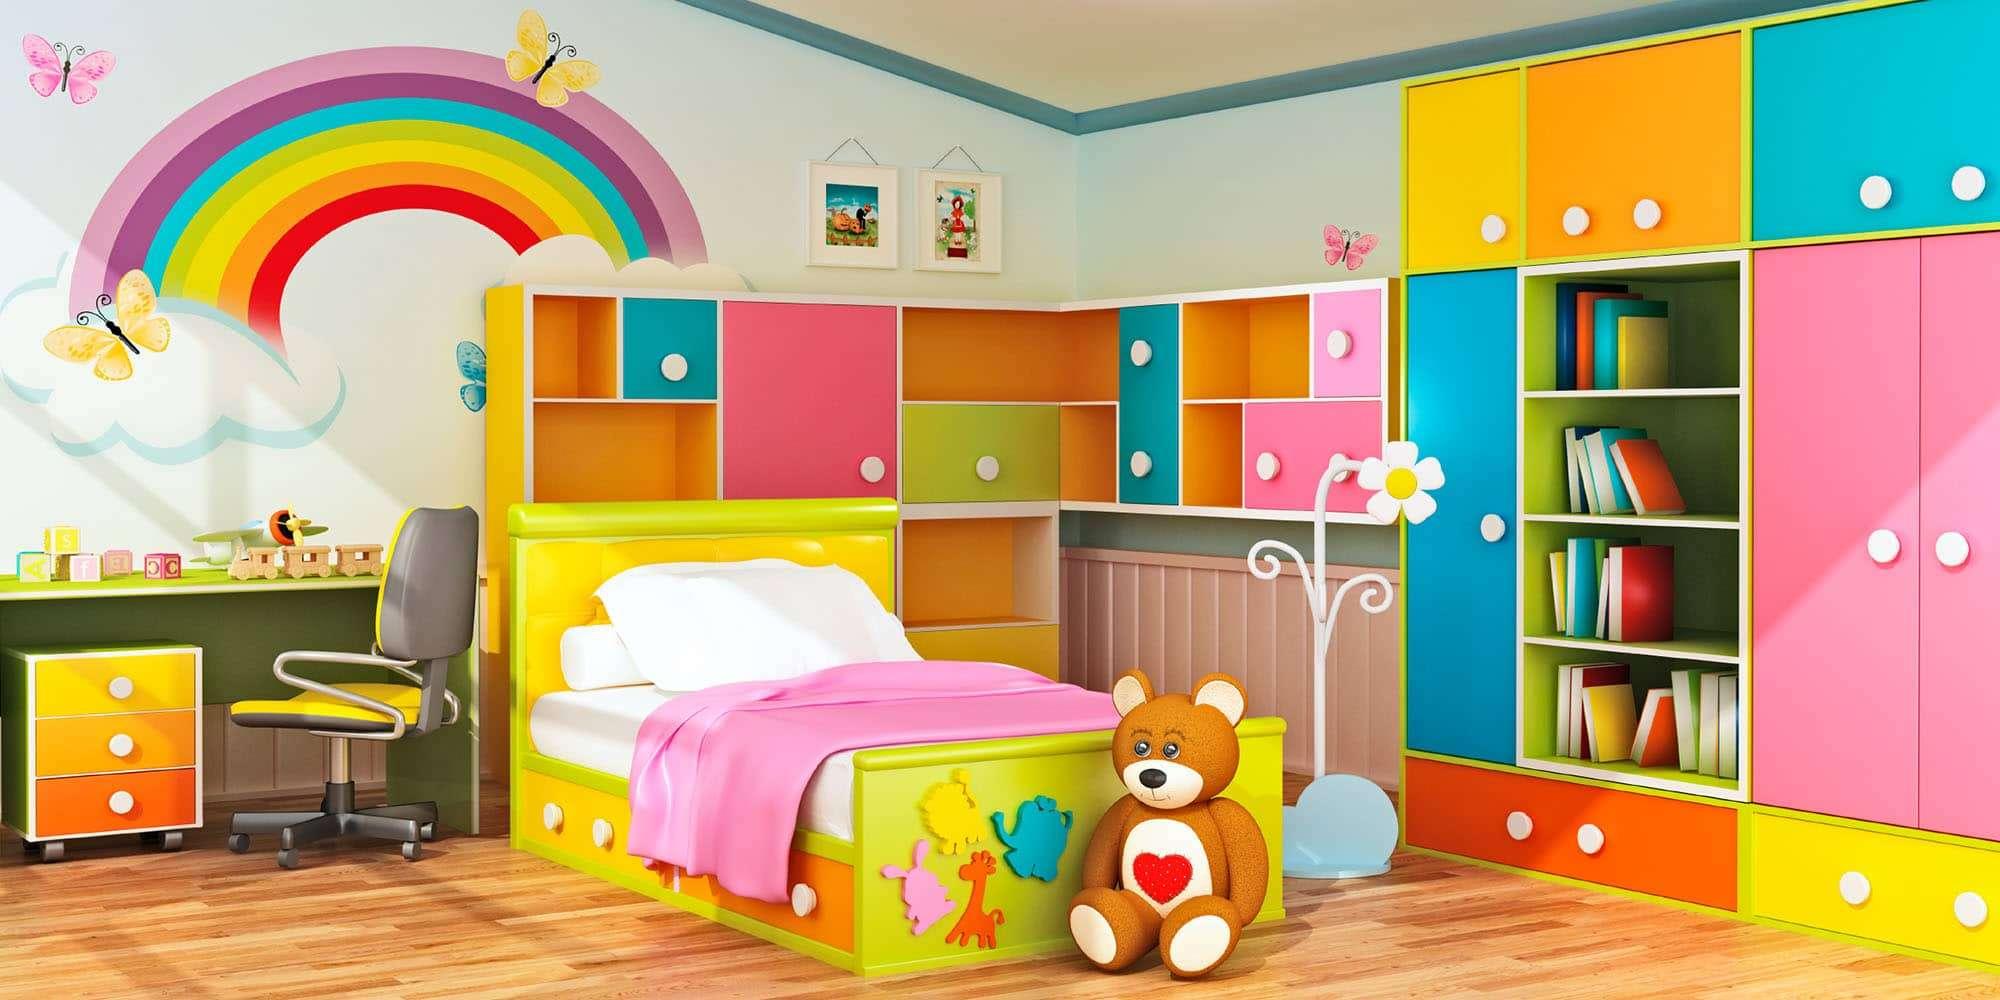 صورة صور غرف اطفال , احدث موديلات غرف الاطفال